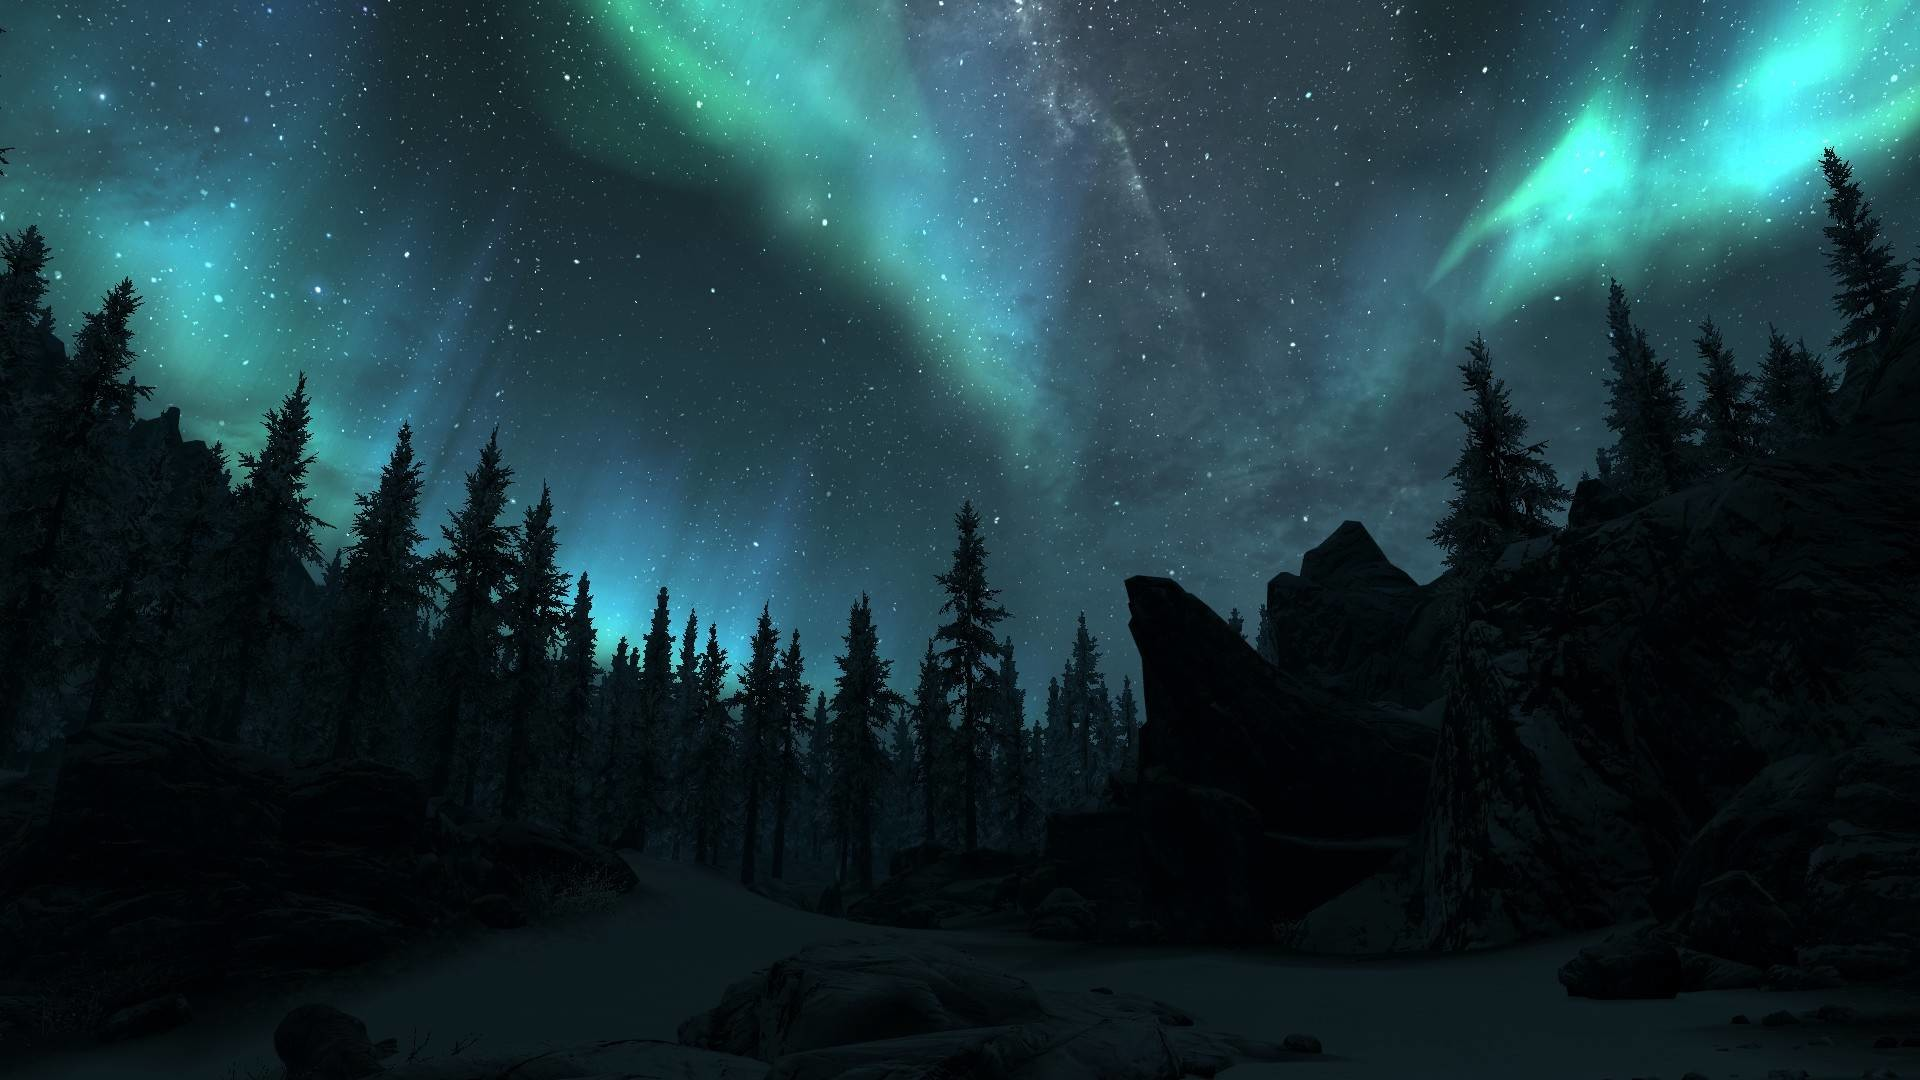 Northern Lights Wallpaper Northern lights,